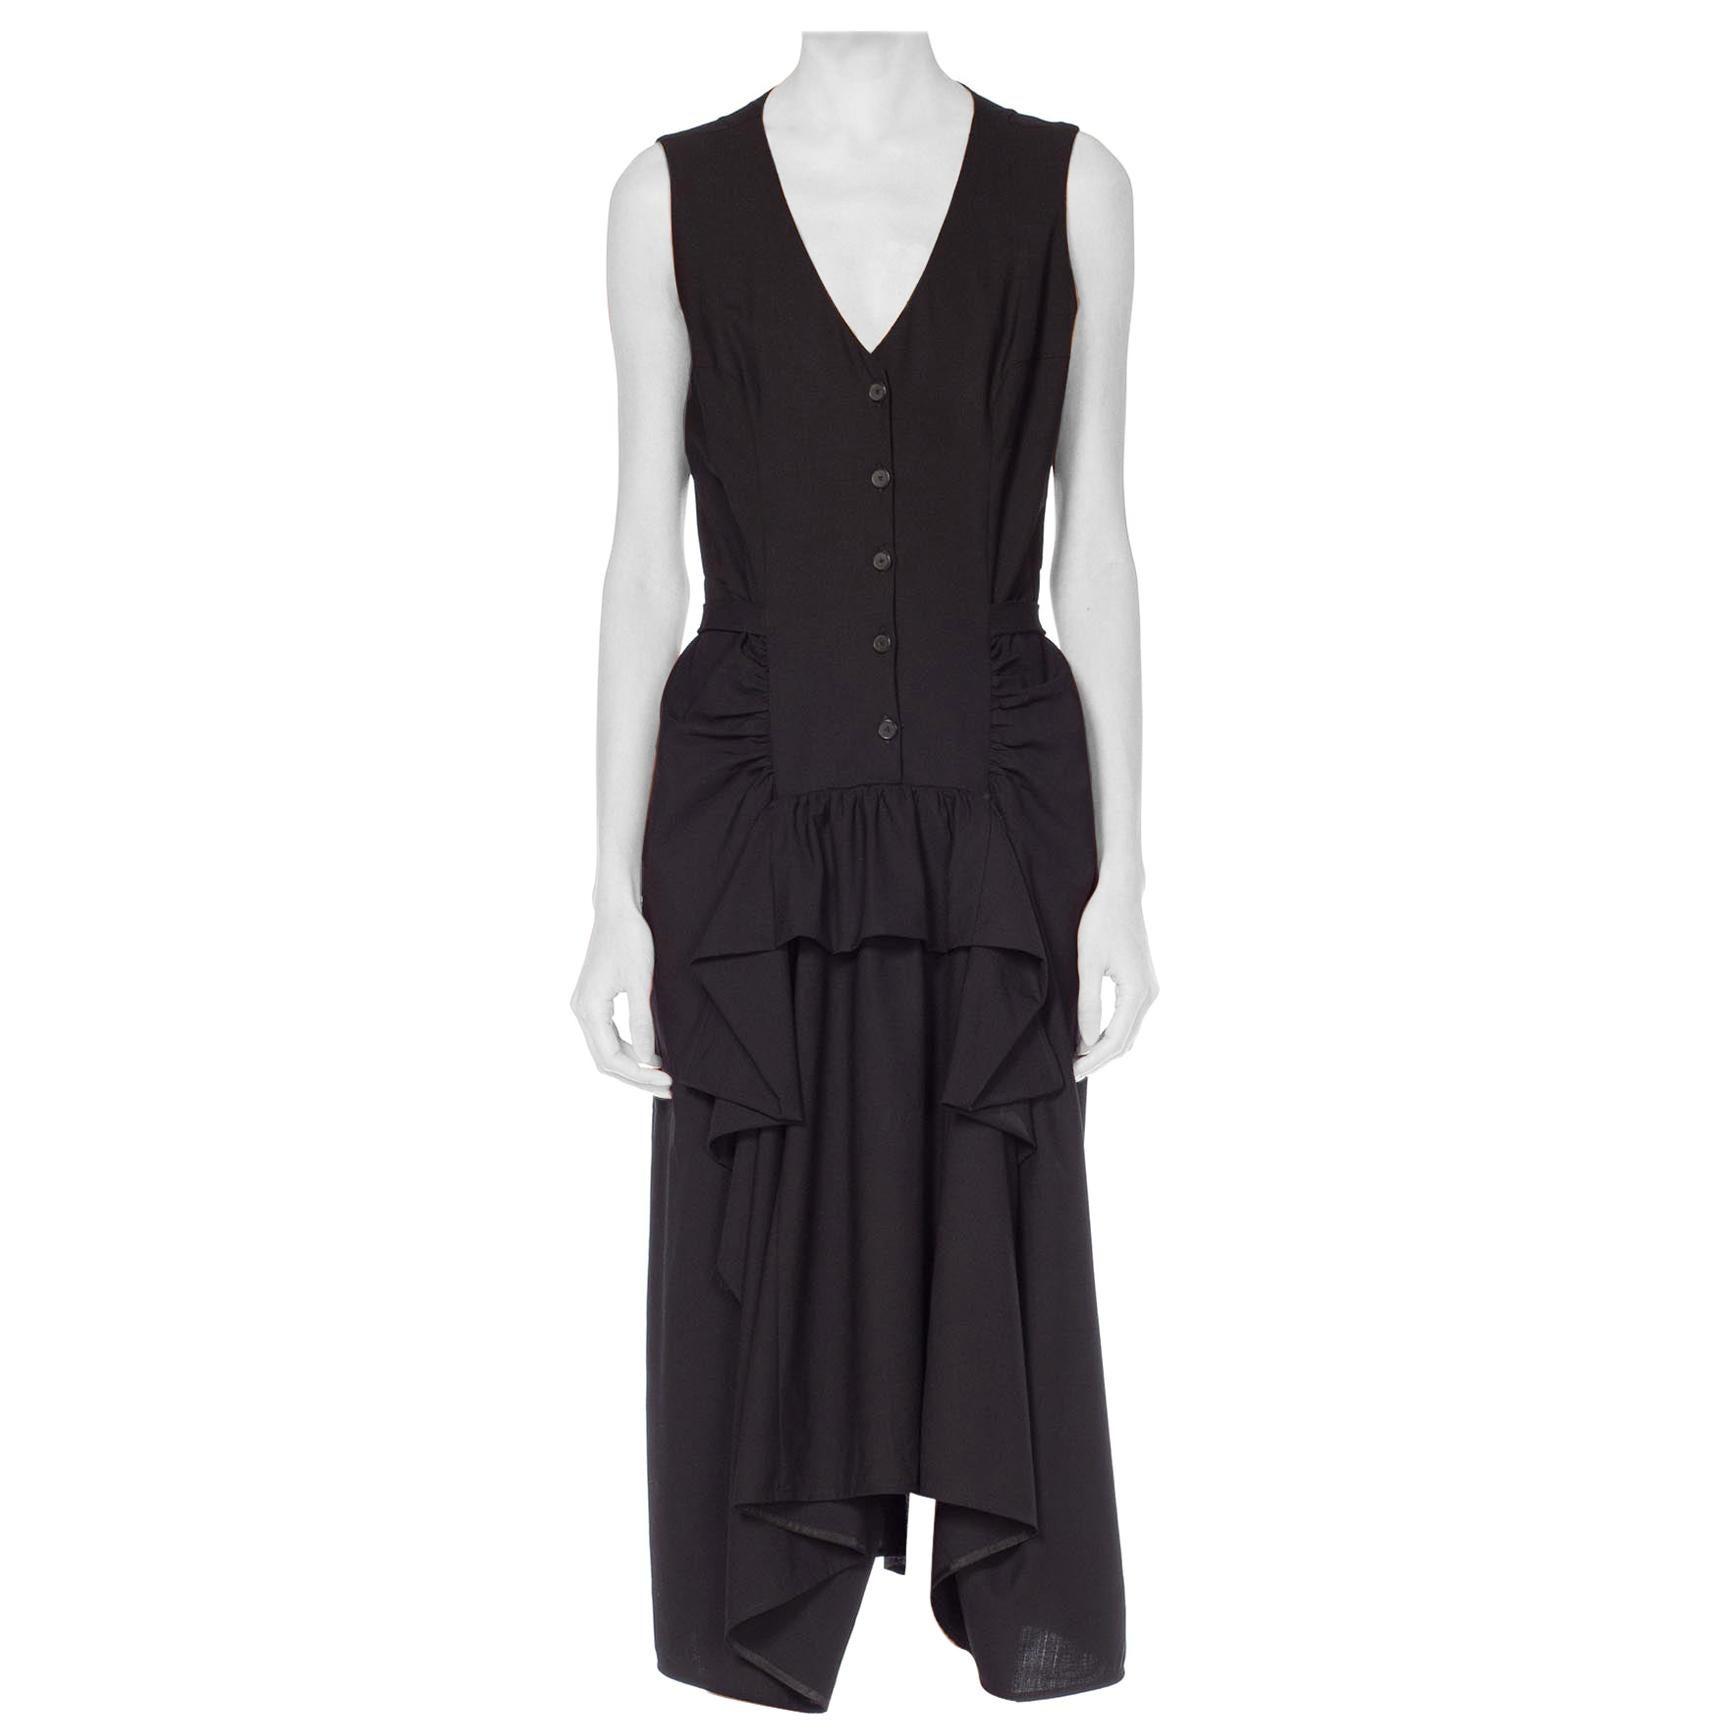 1980S MORGANE LE FAY Black Wool Tuxedo Vest Ruffle Front Asymmetrical Dress